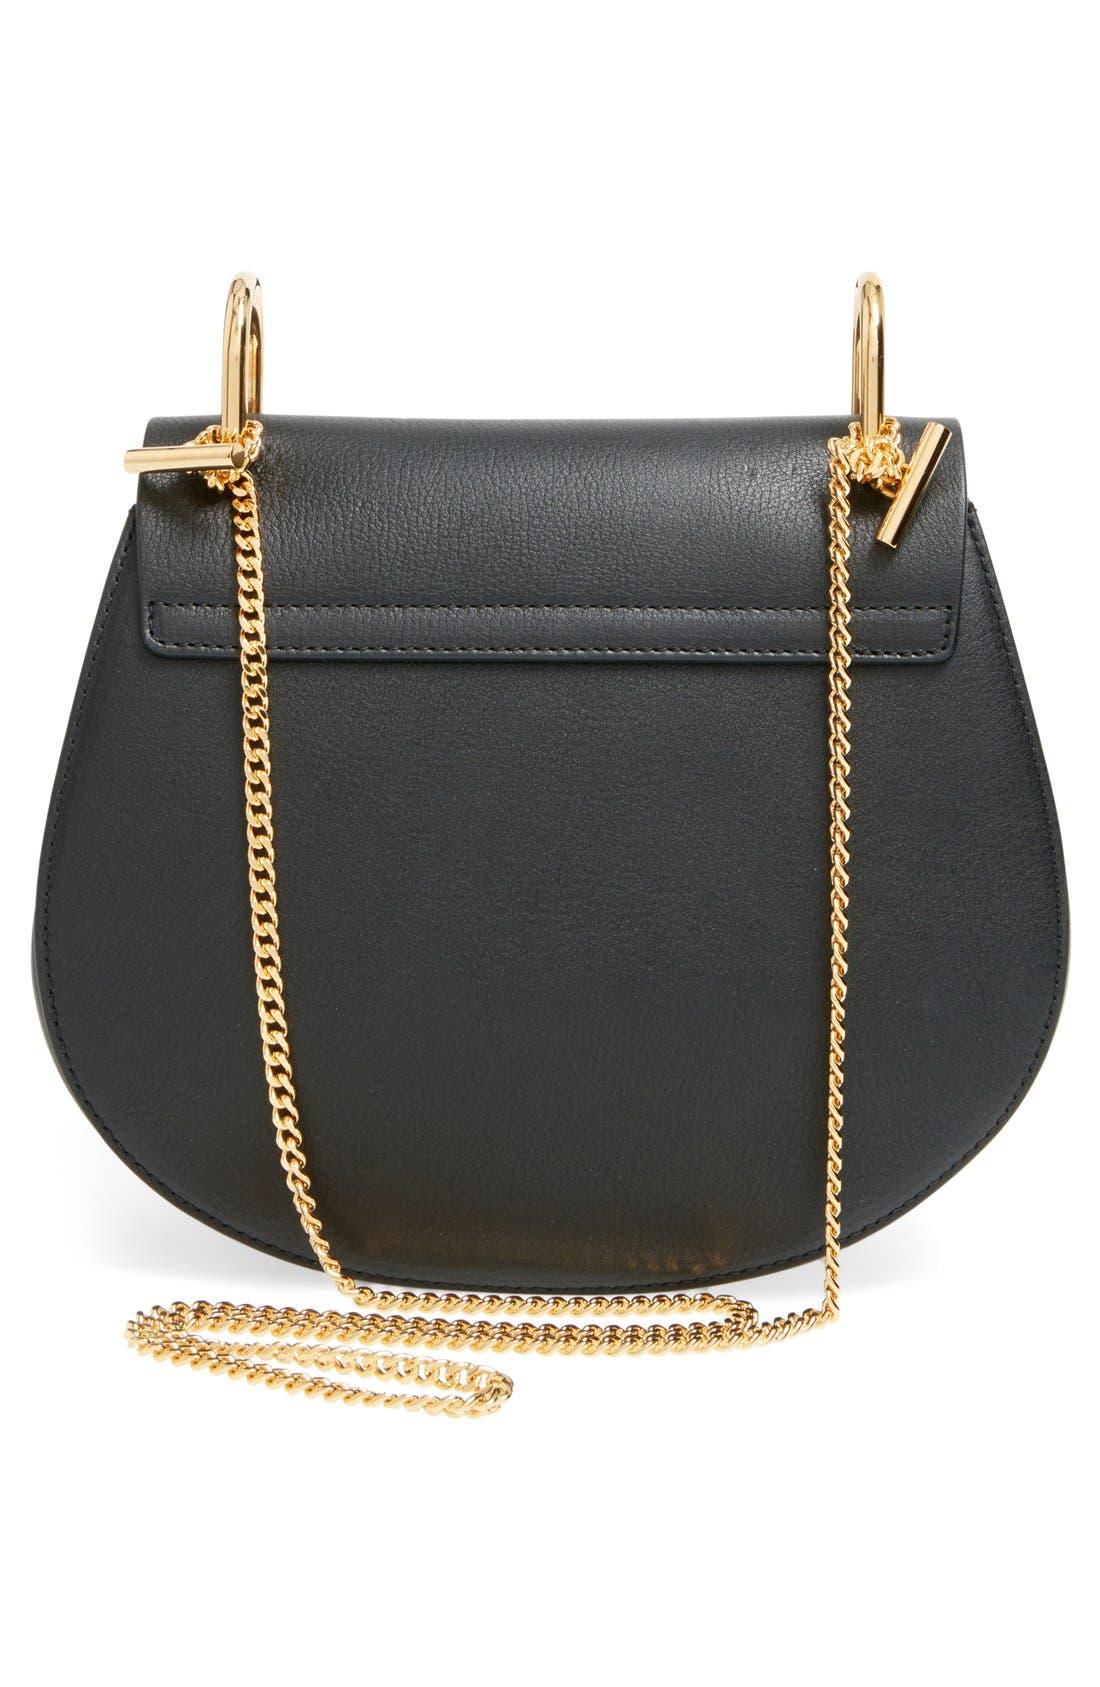 Alternate Image 3  - Chloé'Small Drew' Genuine Python & Calfskin Leather Crossbody Bag